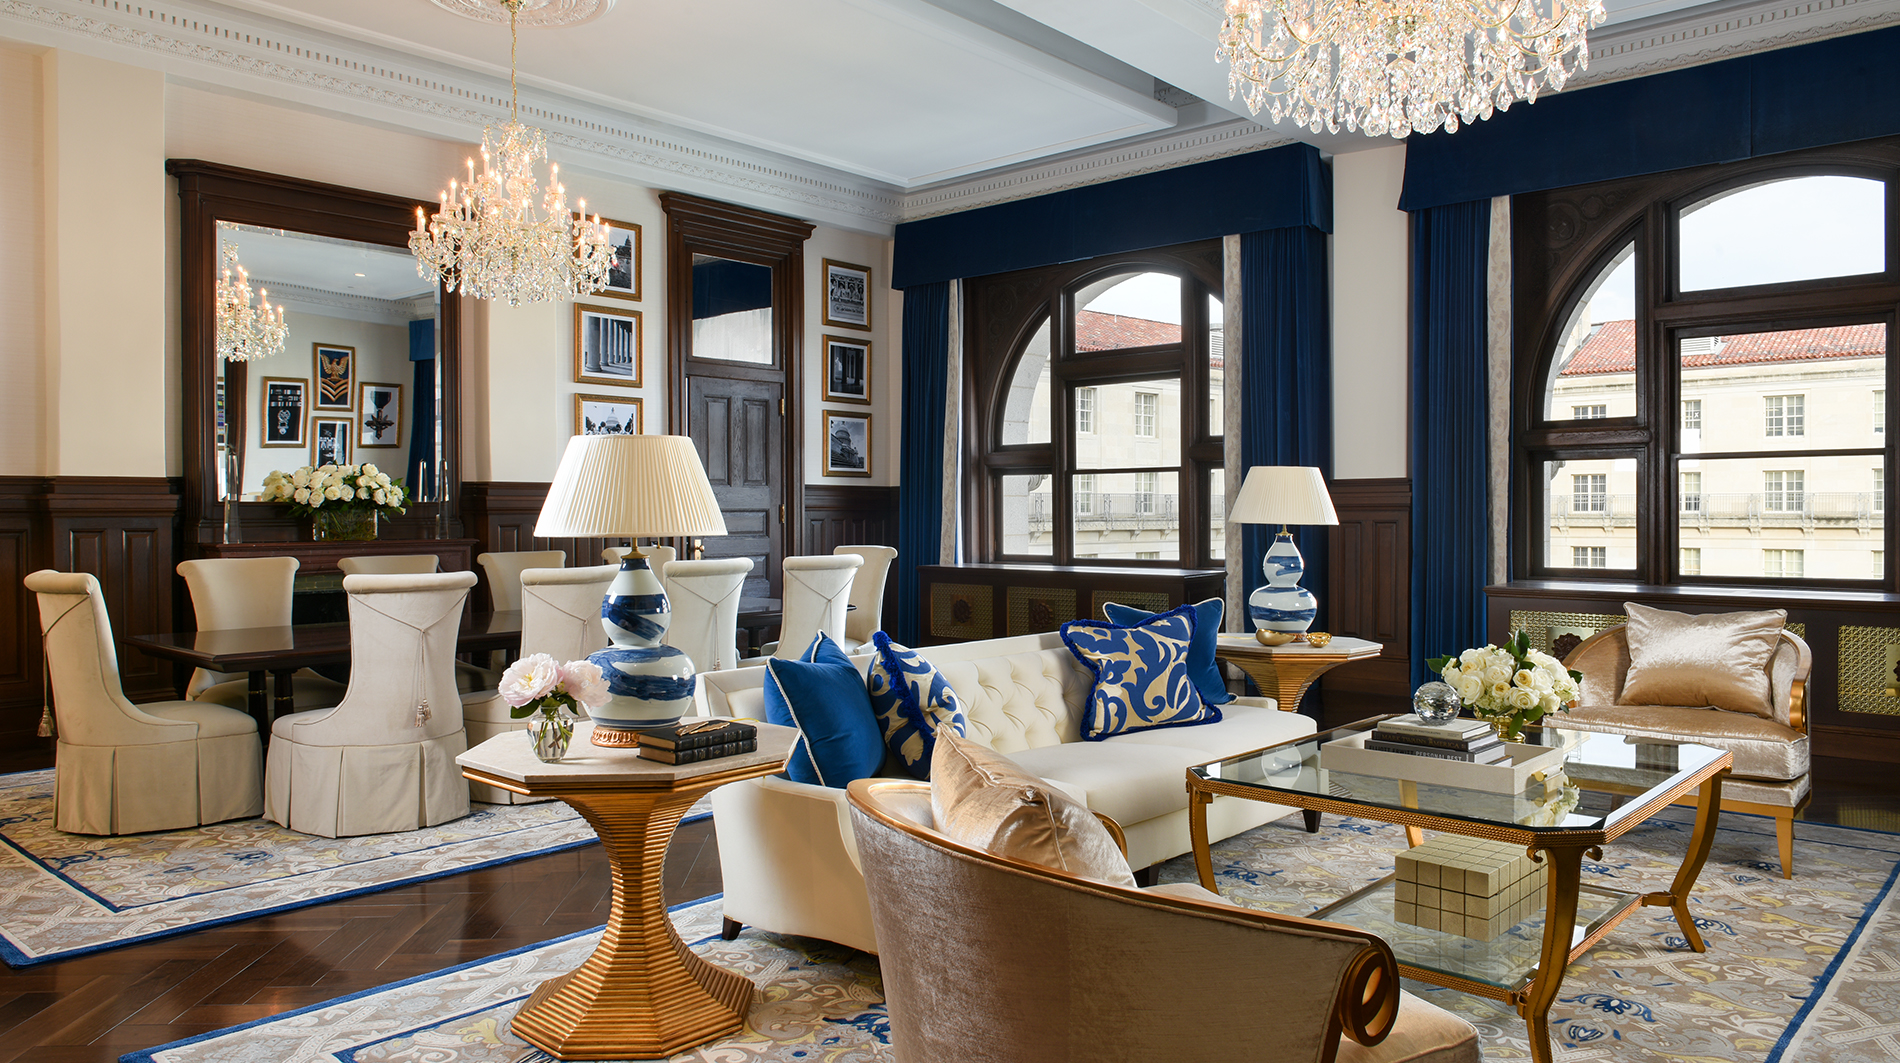 Trump international hotel washington dc Benjamin presidential suite